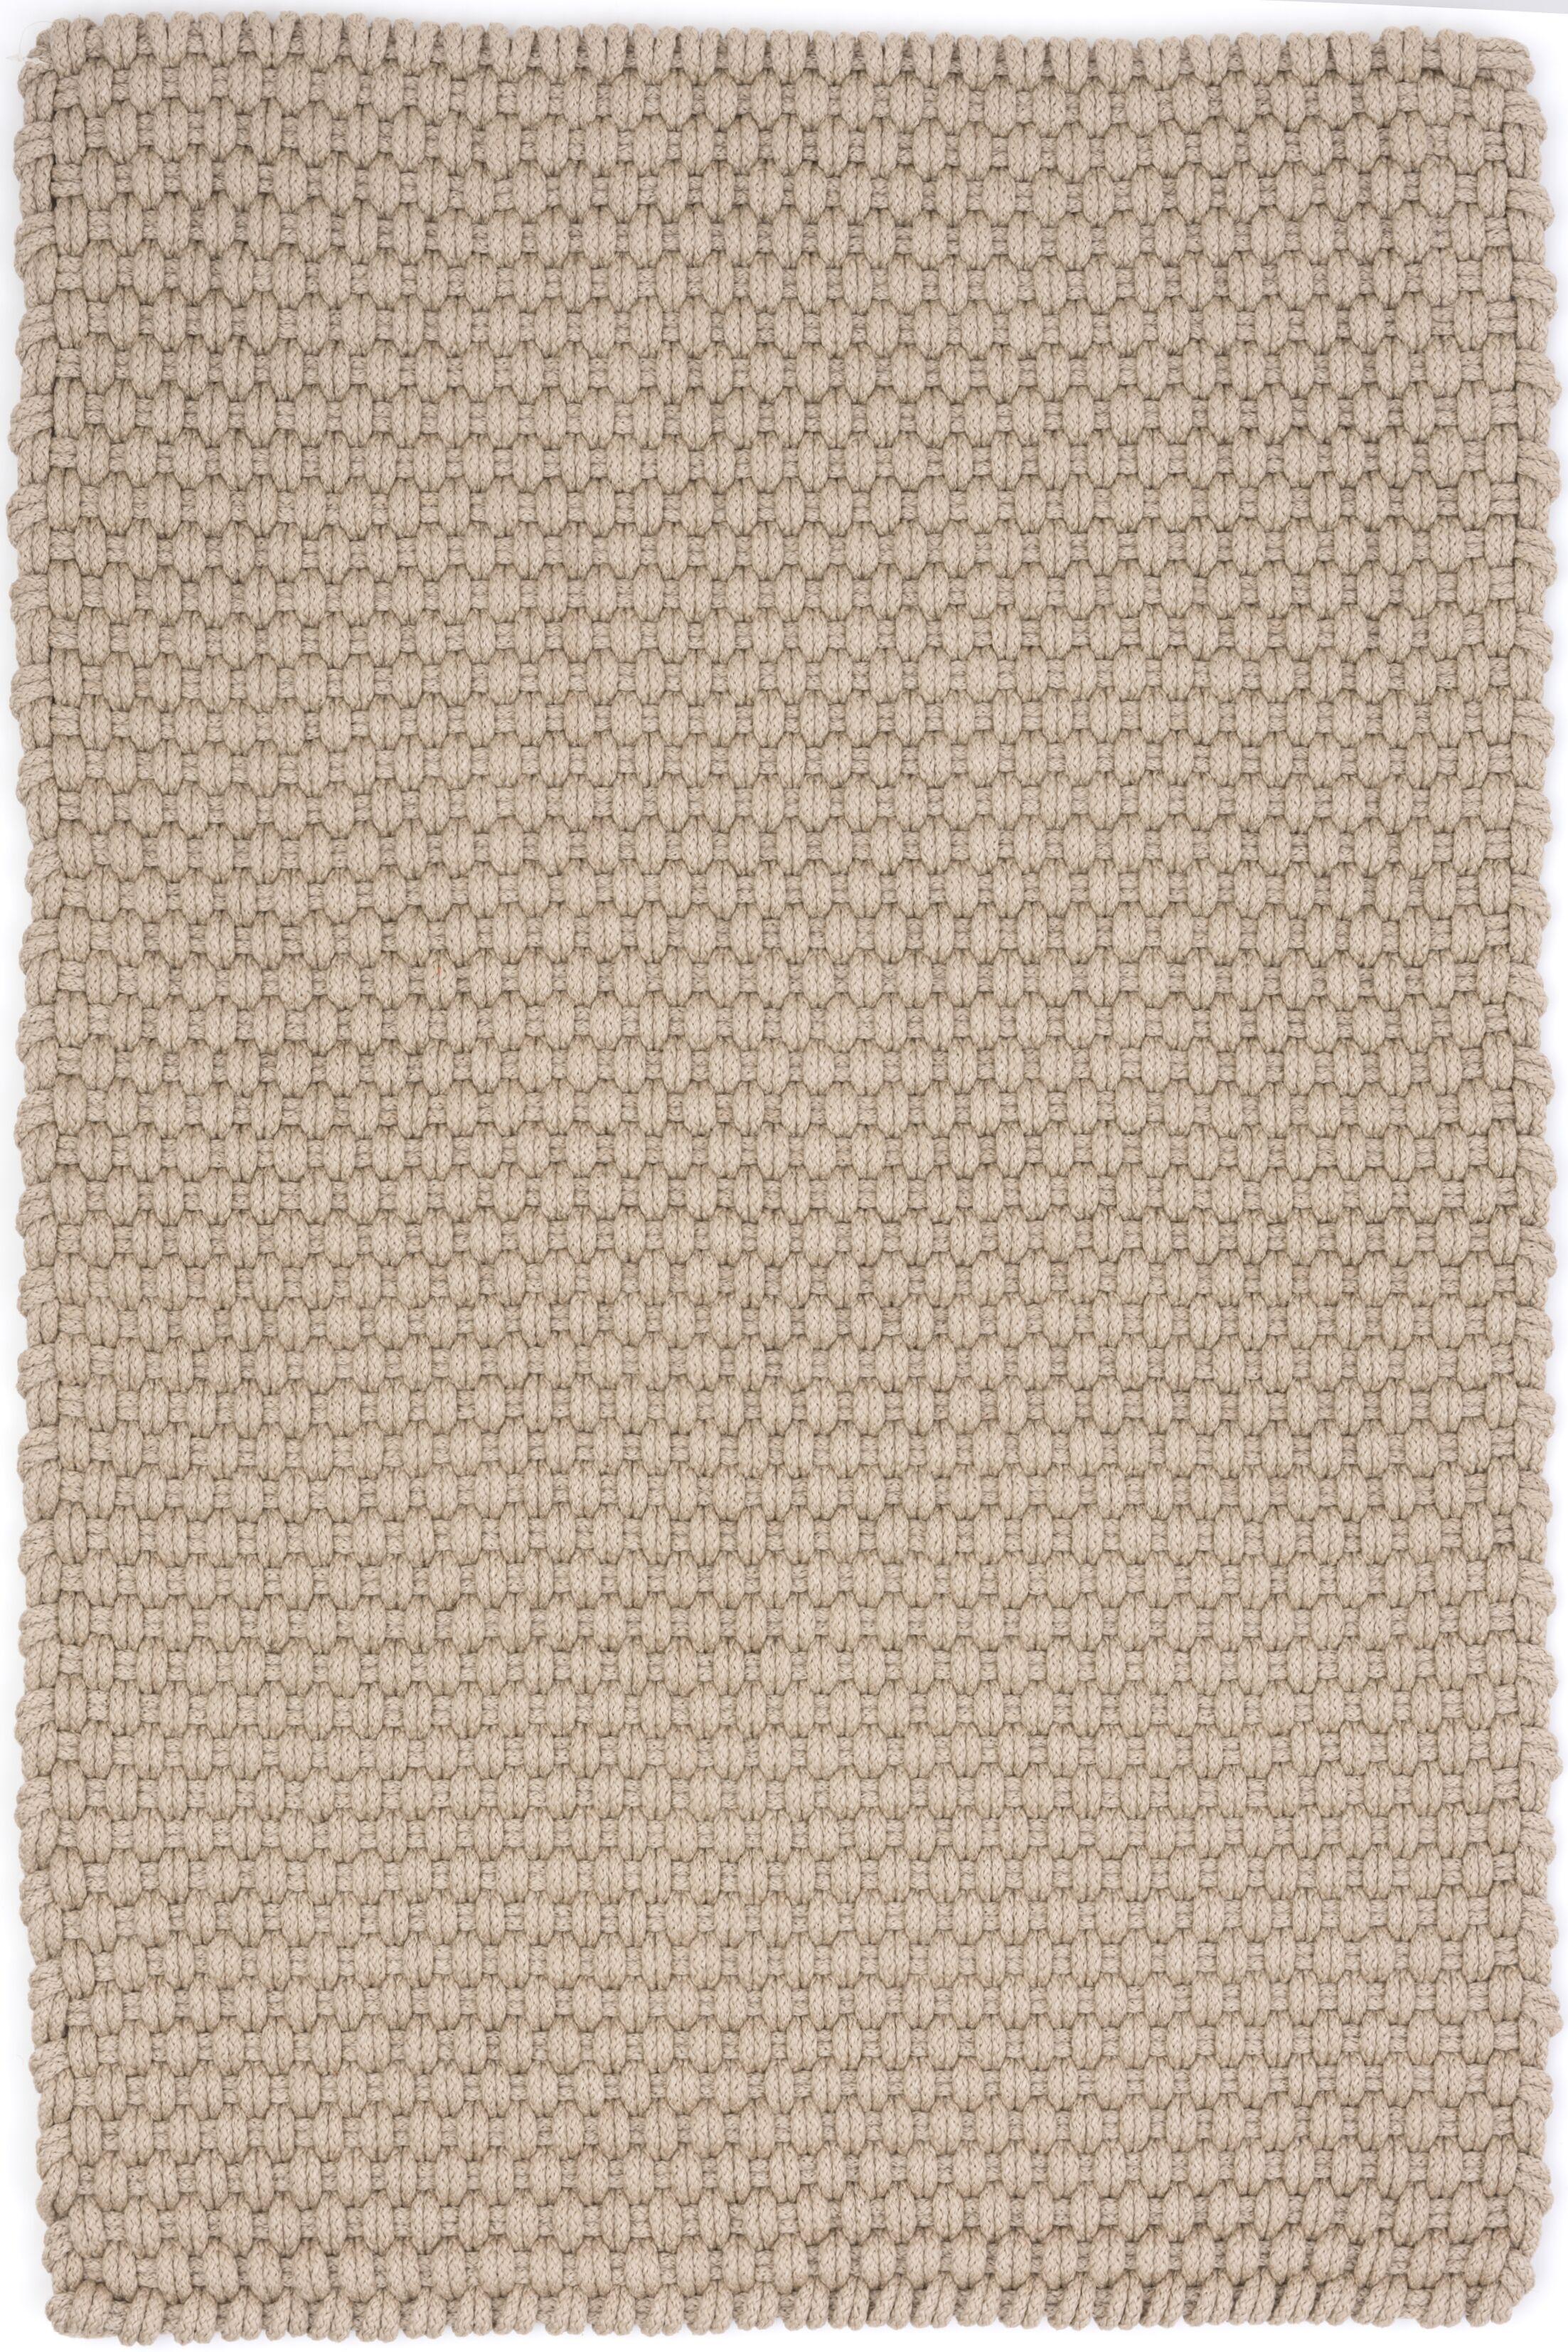 Hand Woven Brown Indoor/Outdoor Area Rug Rug Size: Rectangle 8'6